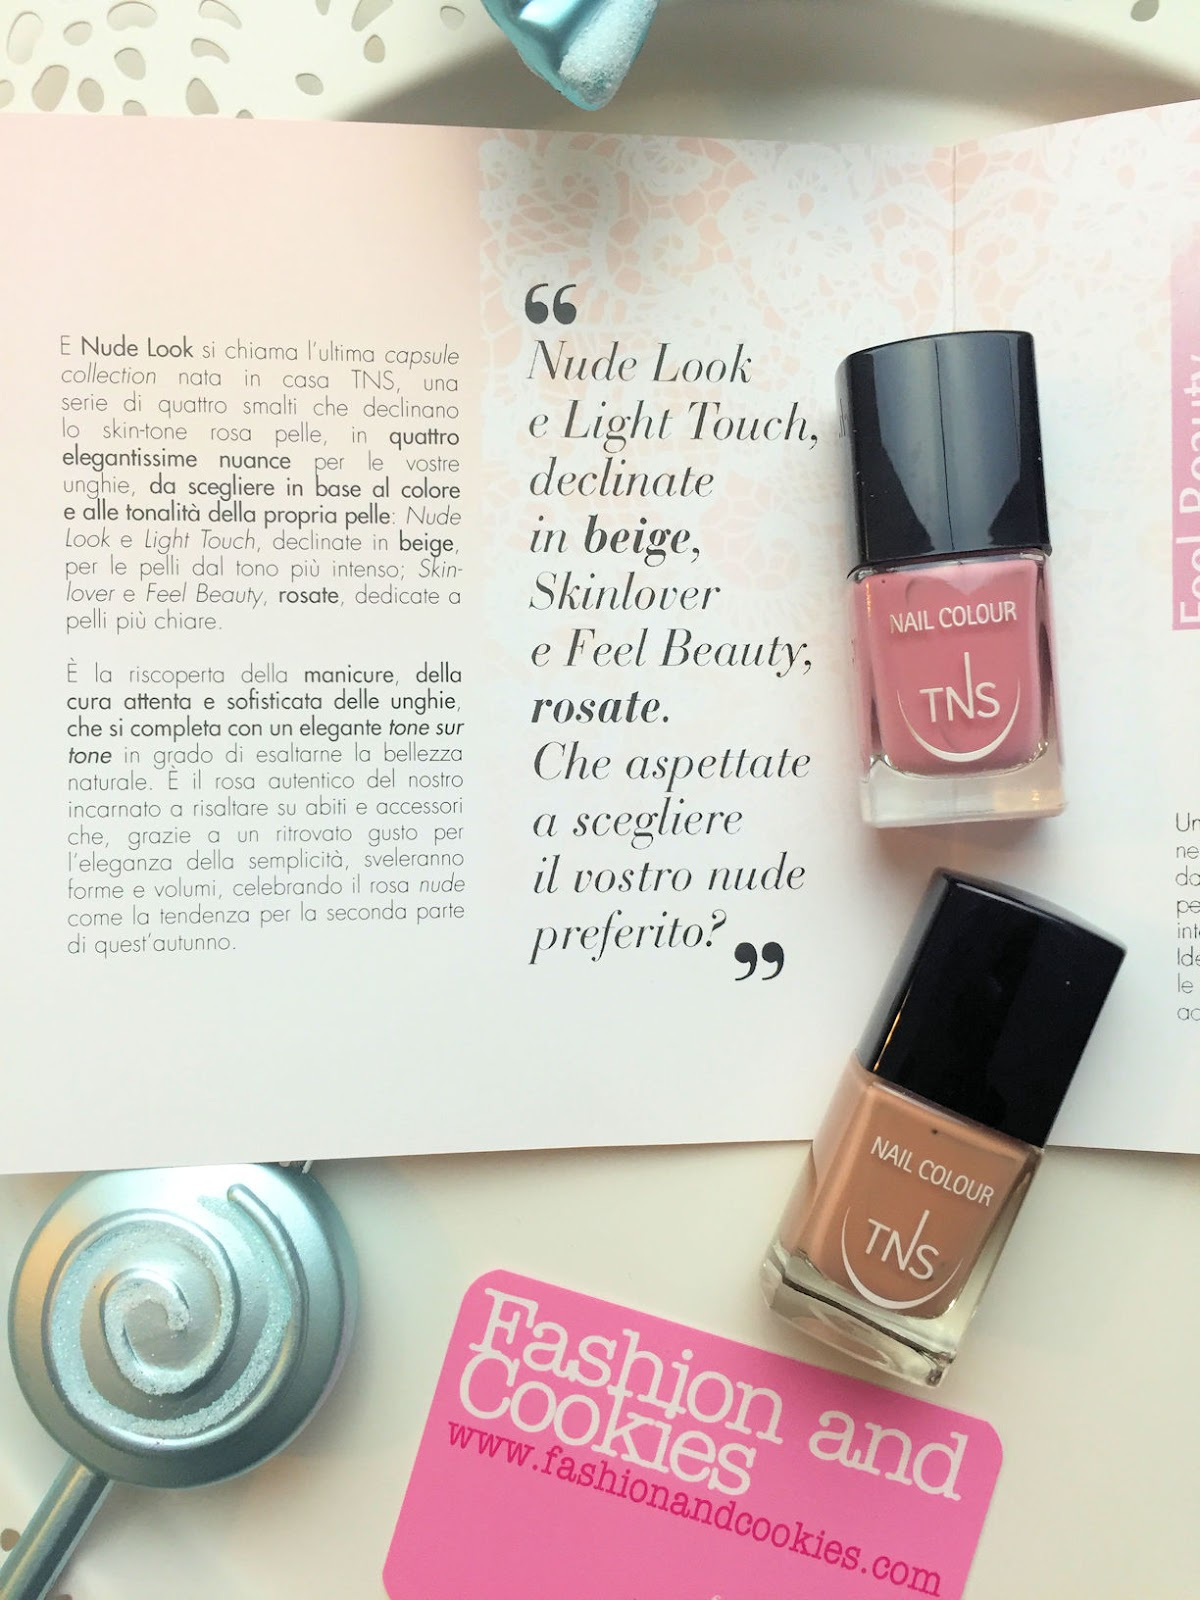 Nude Look Skin Shades Nail Polish Collection By Tns